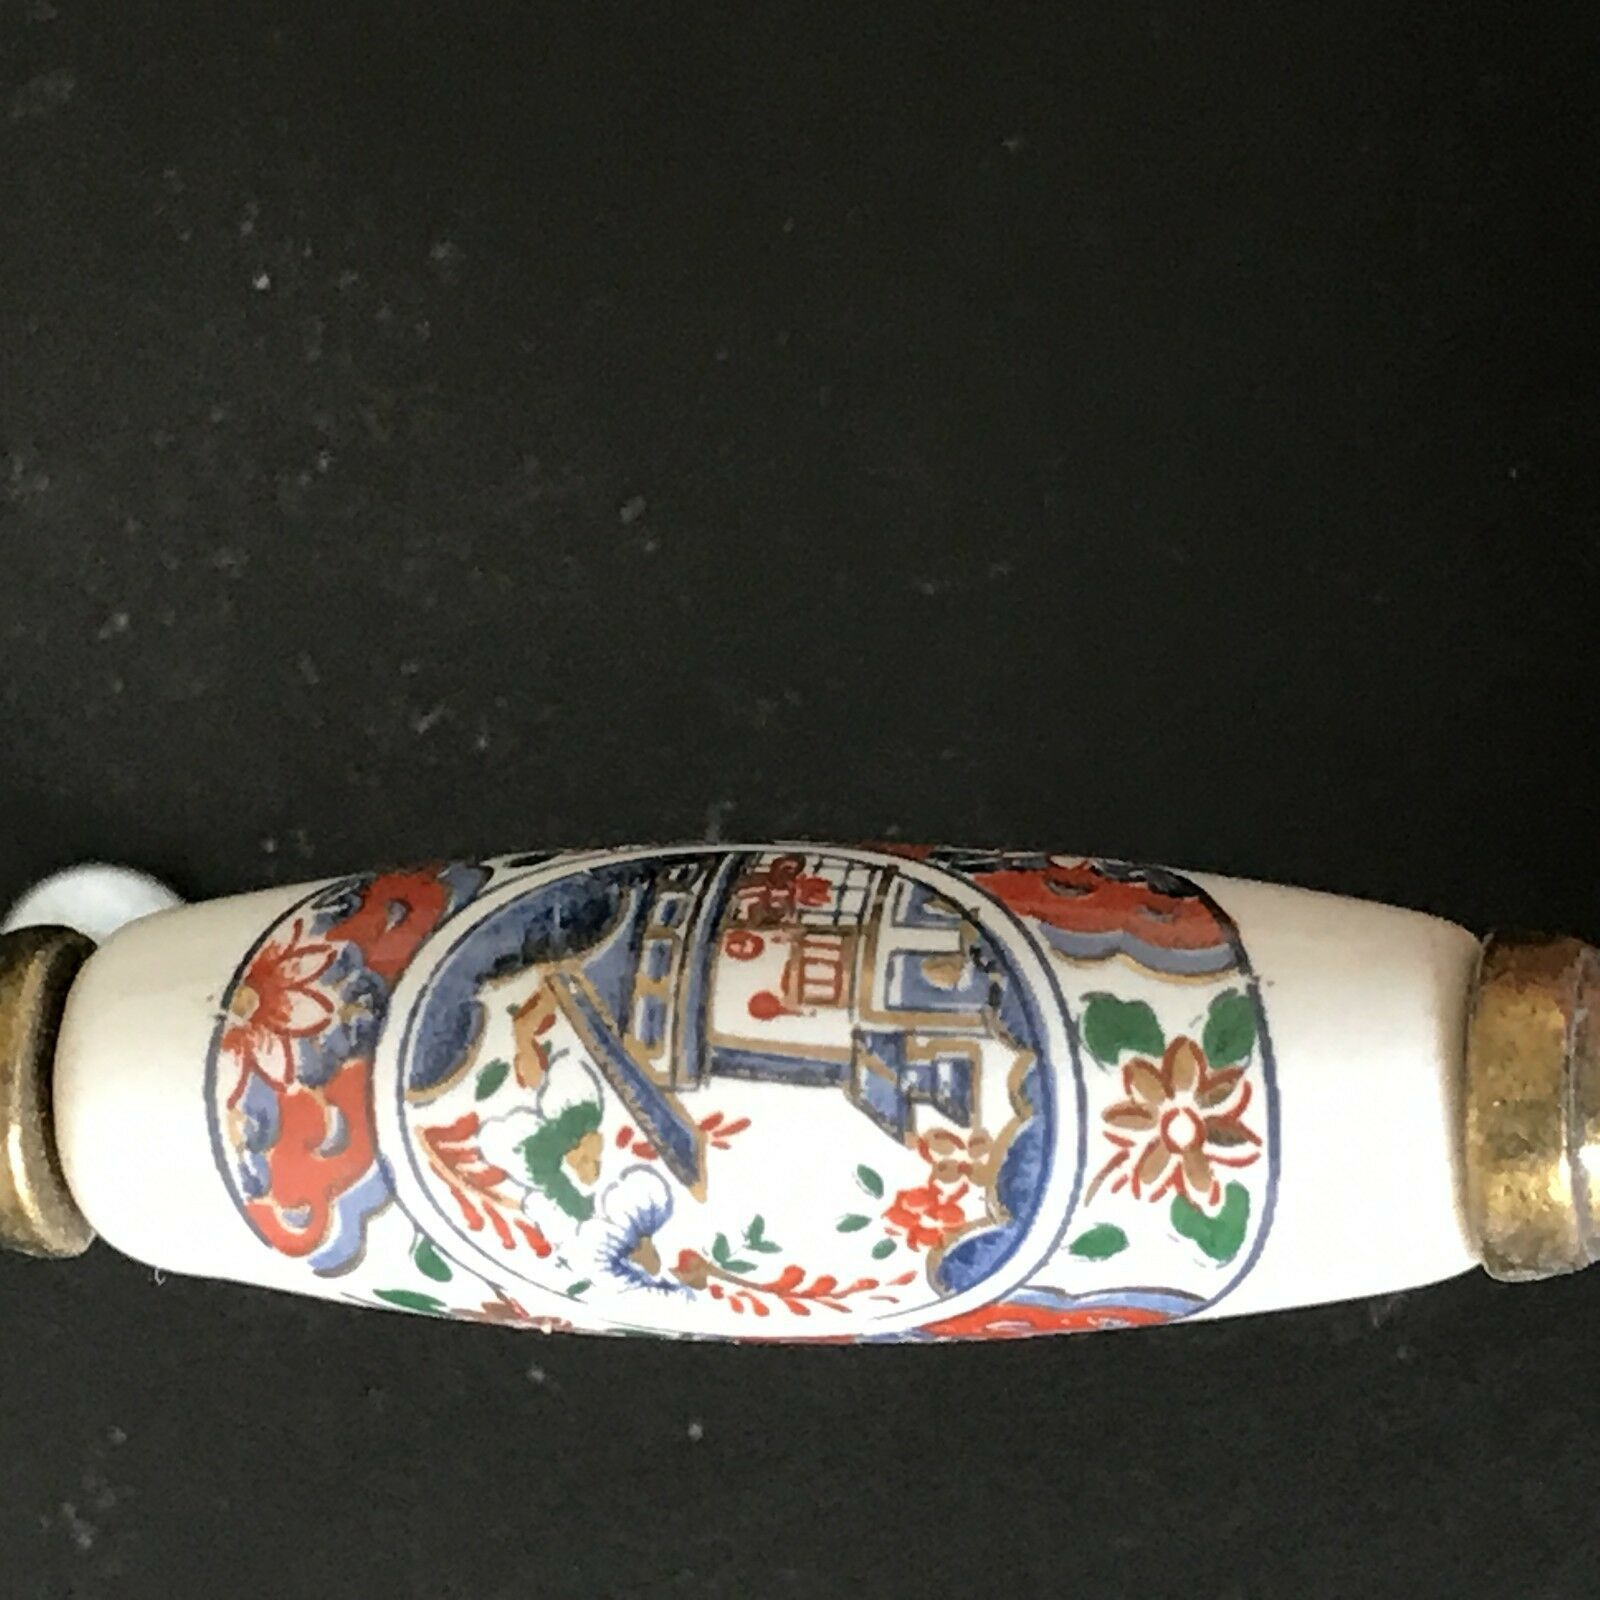 Vintage Ceramic Brass Drawer Pulls Handles Asian Japanese Art Set of 2 image 3